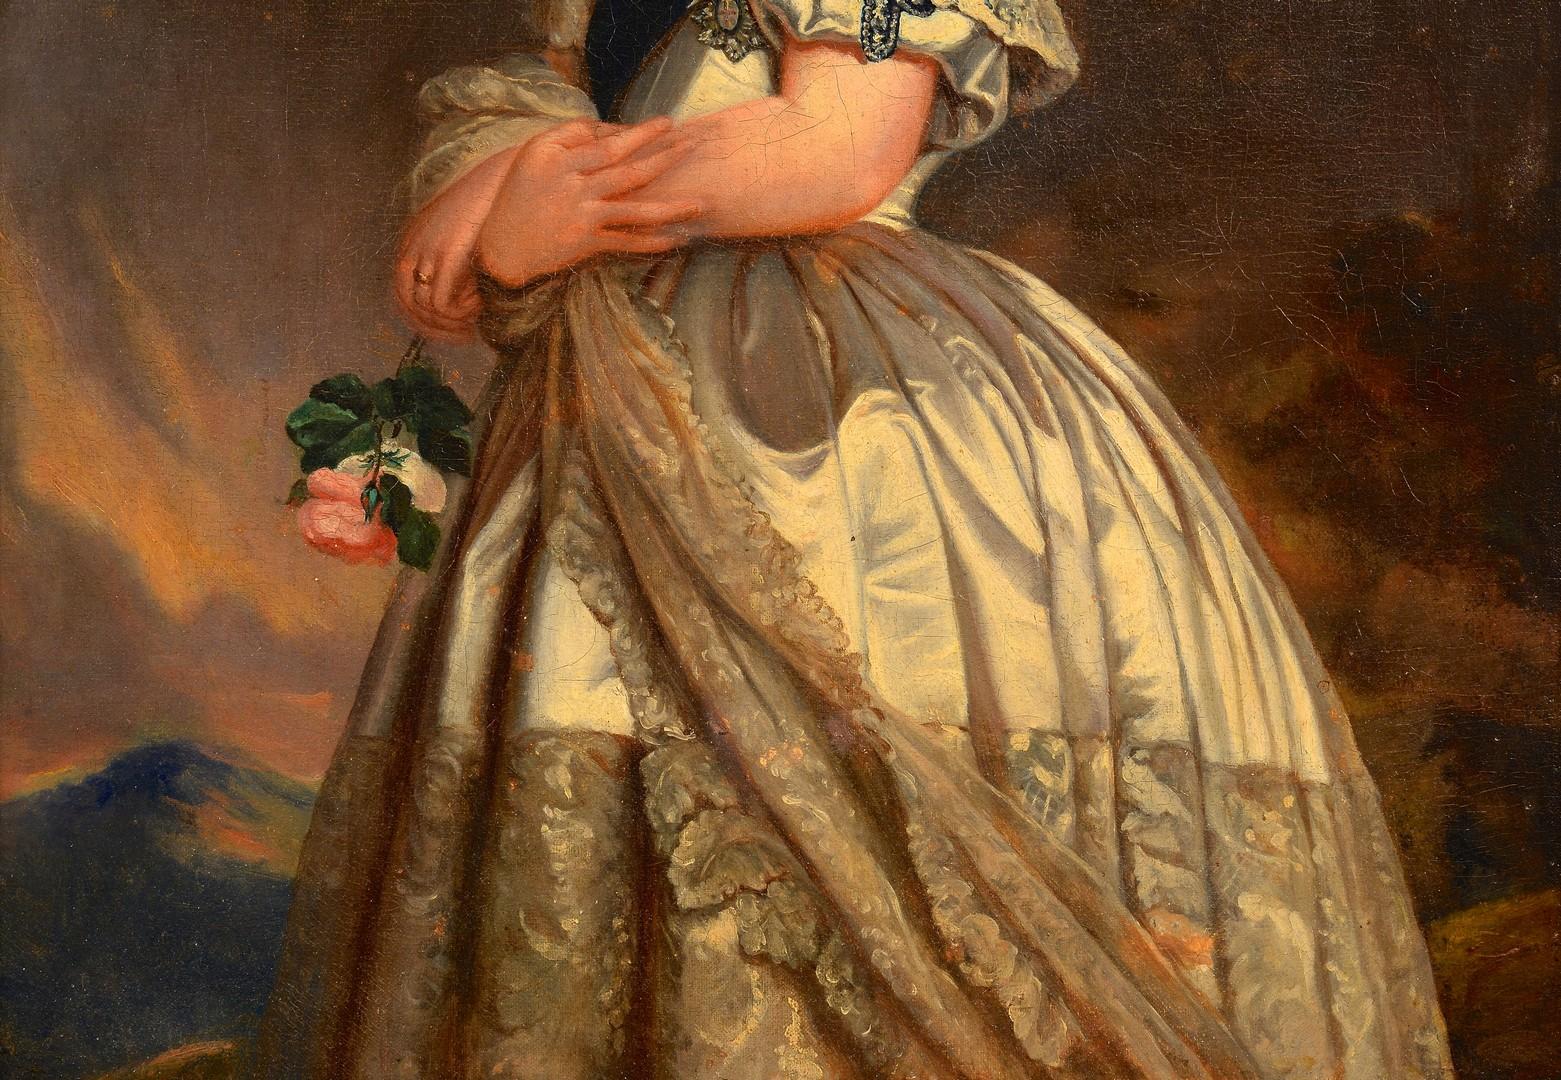 Lot 93: After F. Winterhalter, Queen Victoria portrait